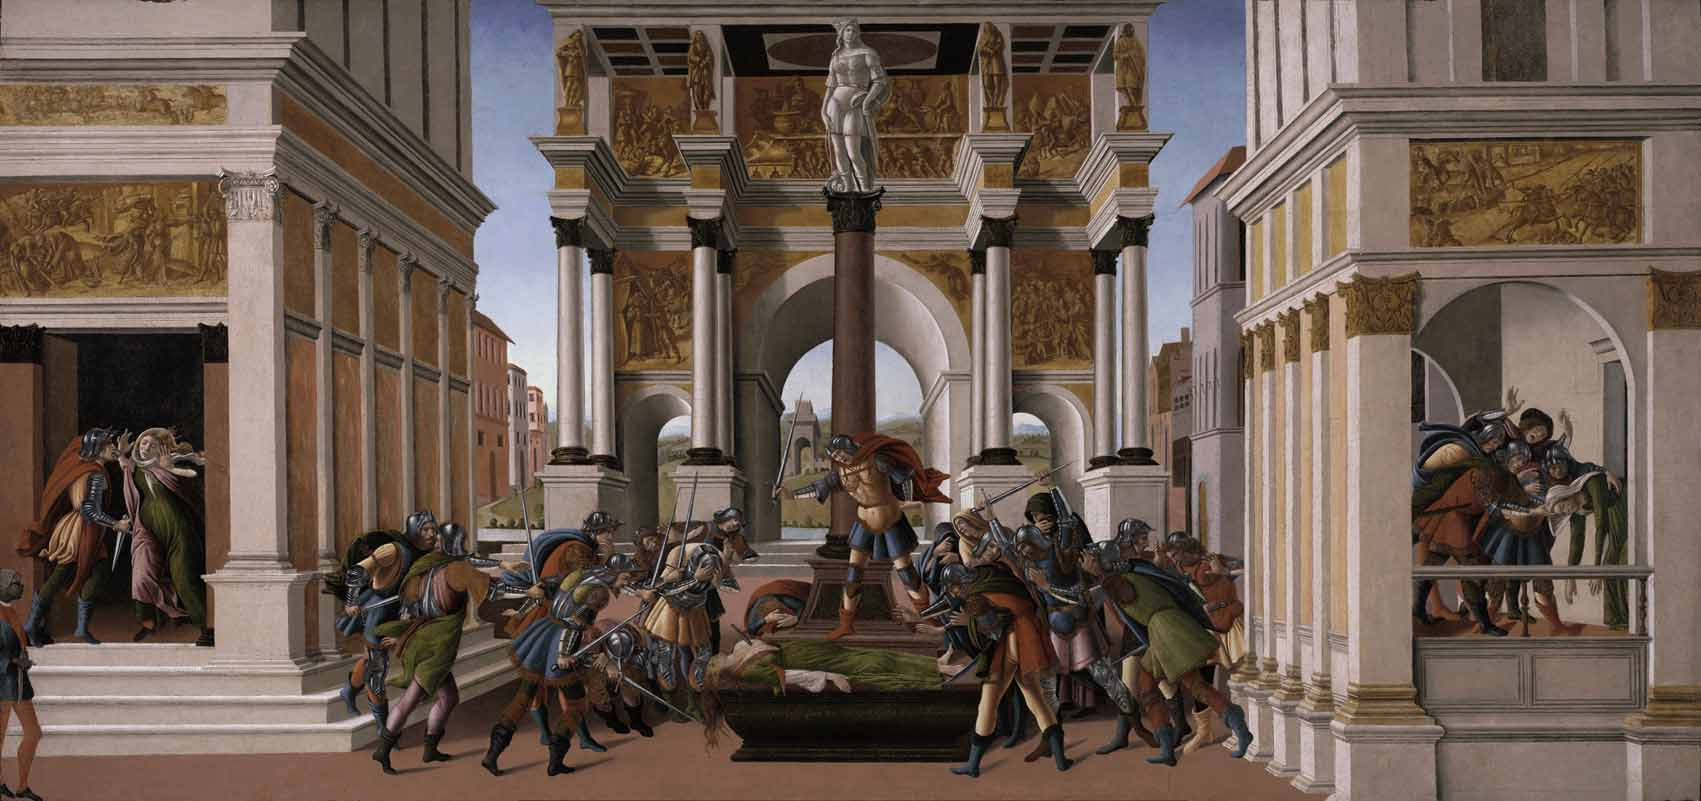 Las heroínas de Sandro Botticelli desde una perspectiva de género Artes & contextos Storia di Lucrezia h1505